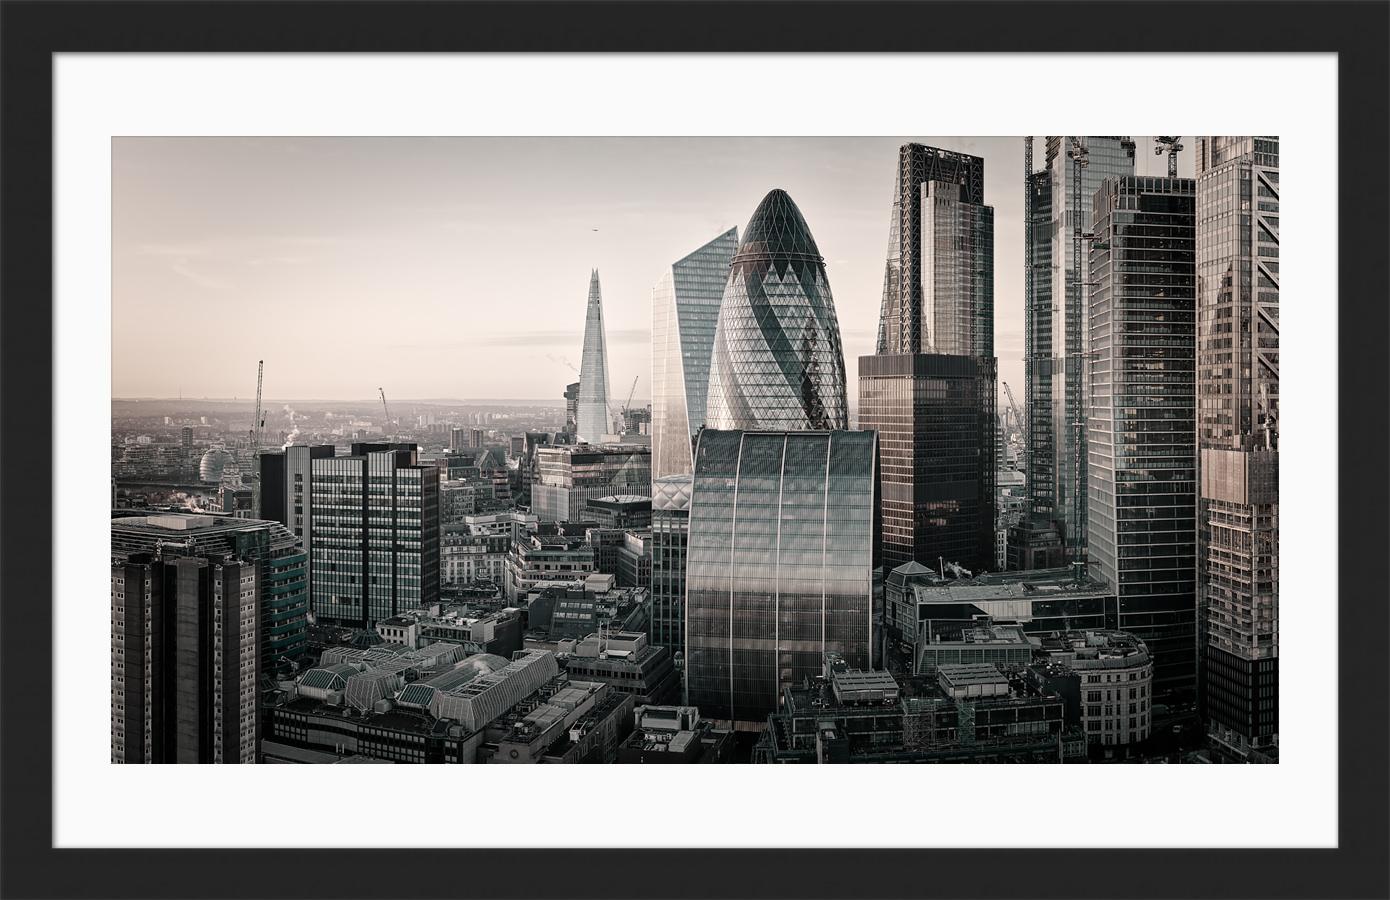 The City Awaits - Framed London Fine Art Photgraphic Print